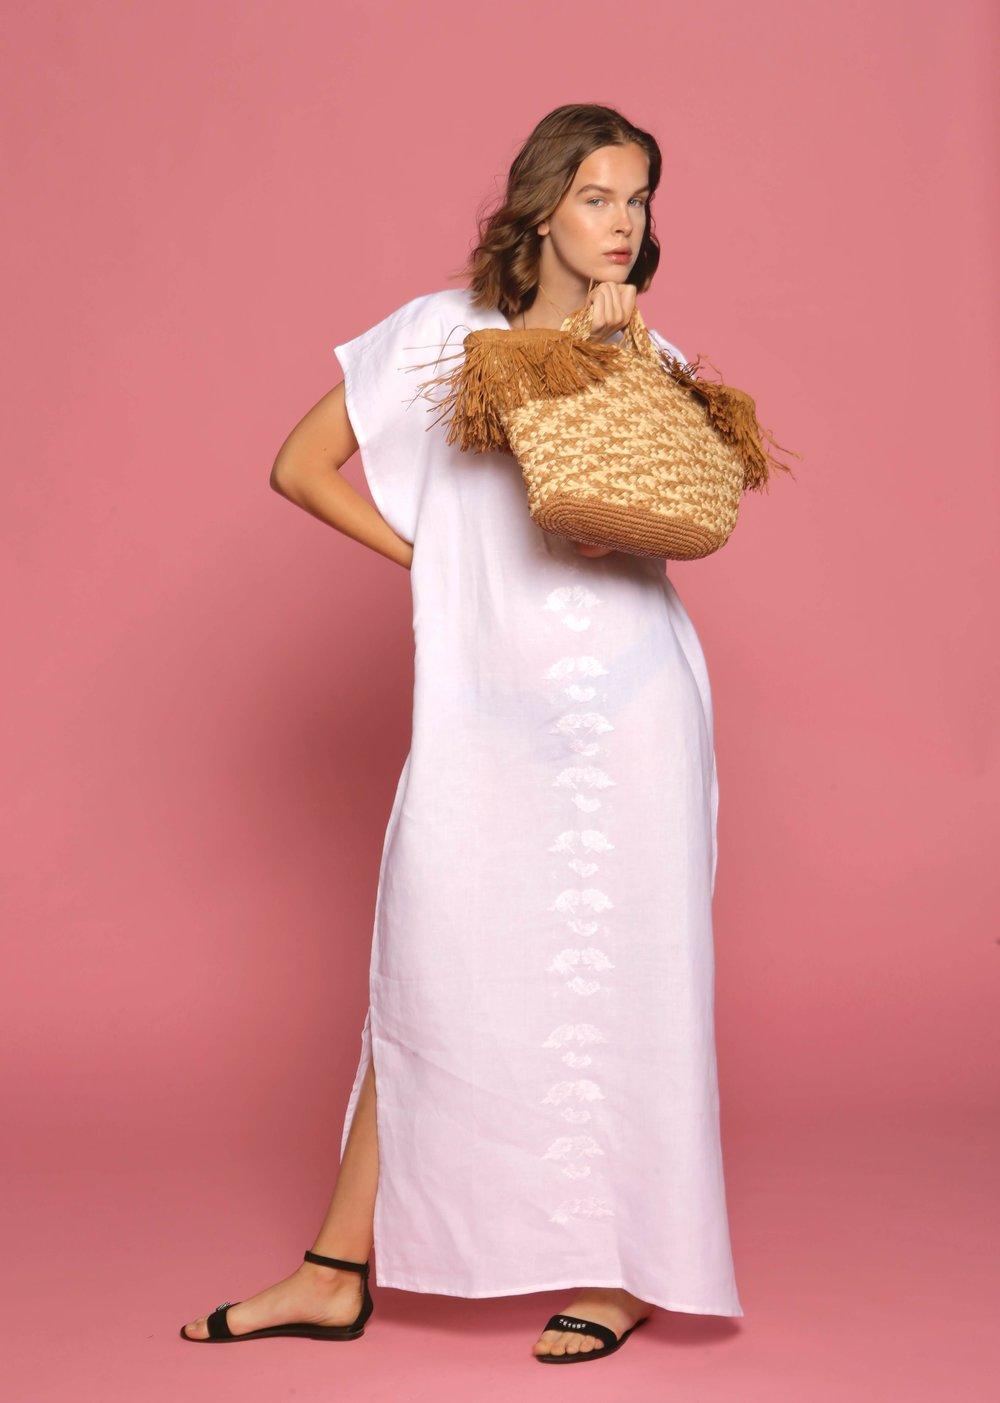 linin kaftan and woven beach bag.jpeg